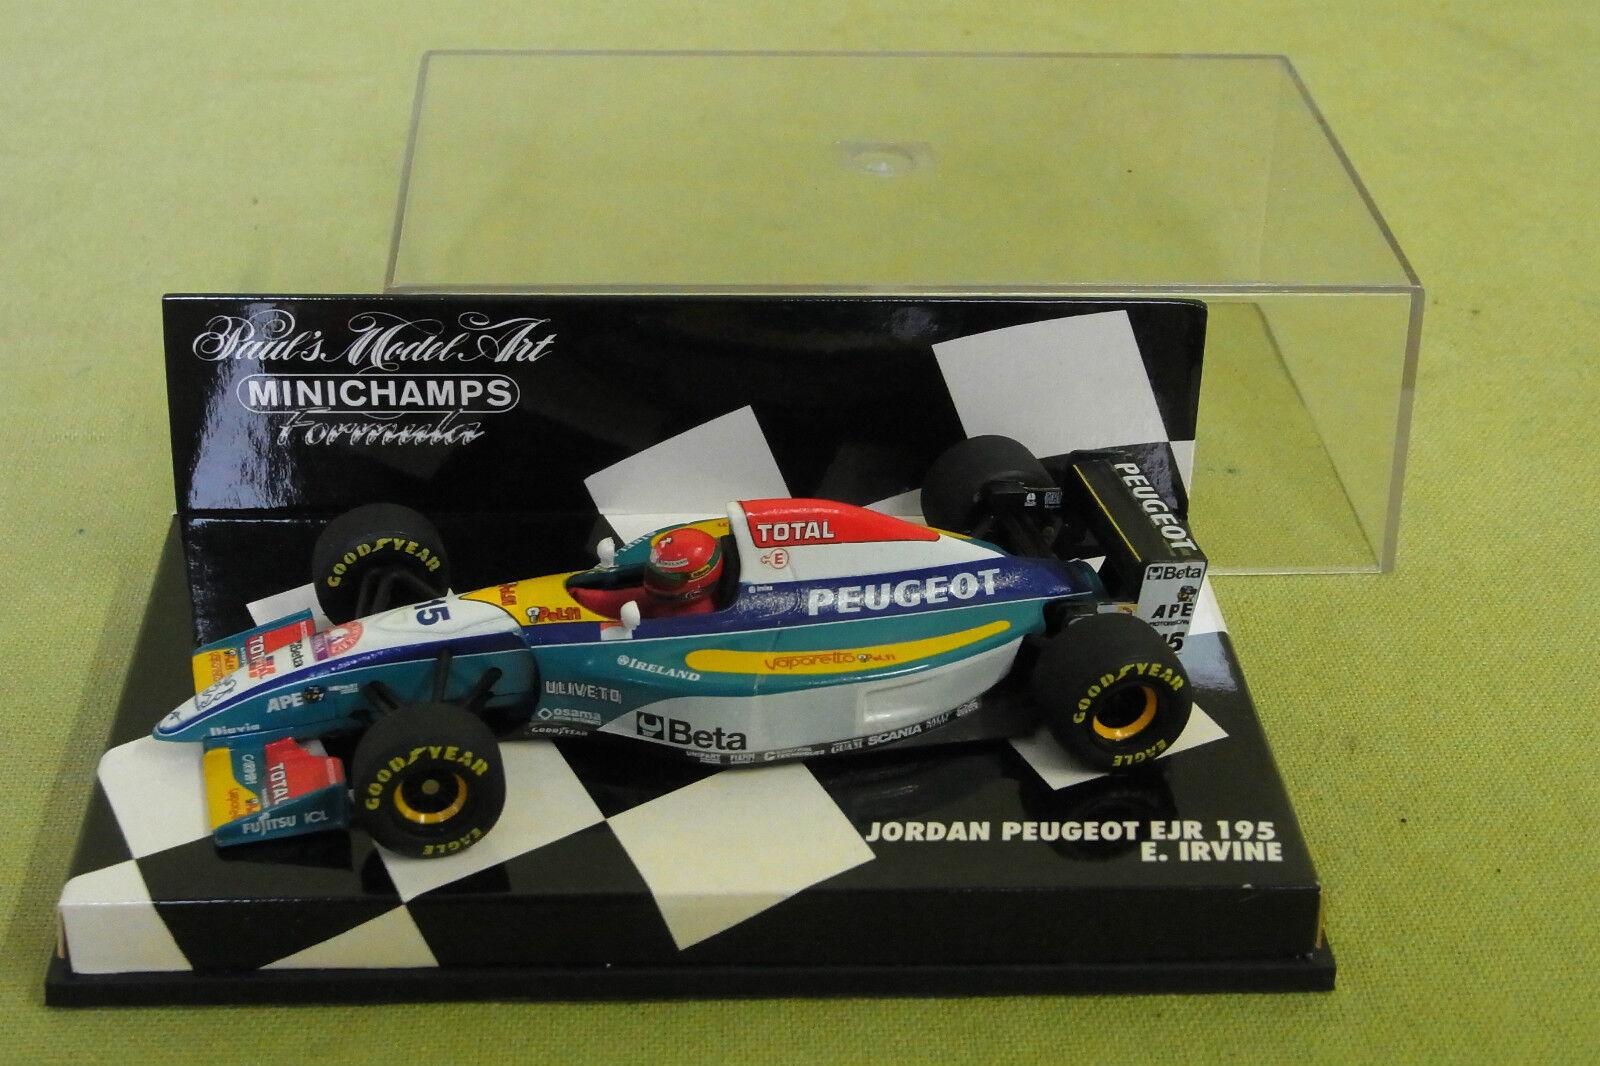 Minichamps - Jordan Peugeot - EJR 195 - E. Irvine